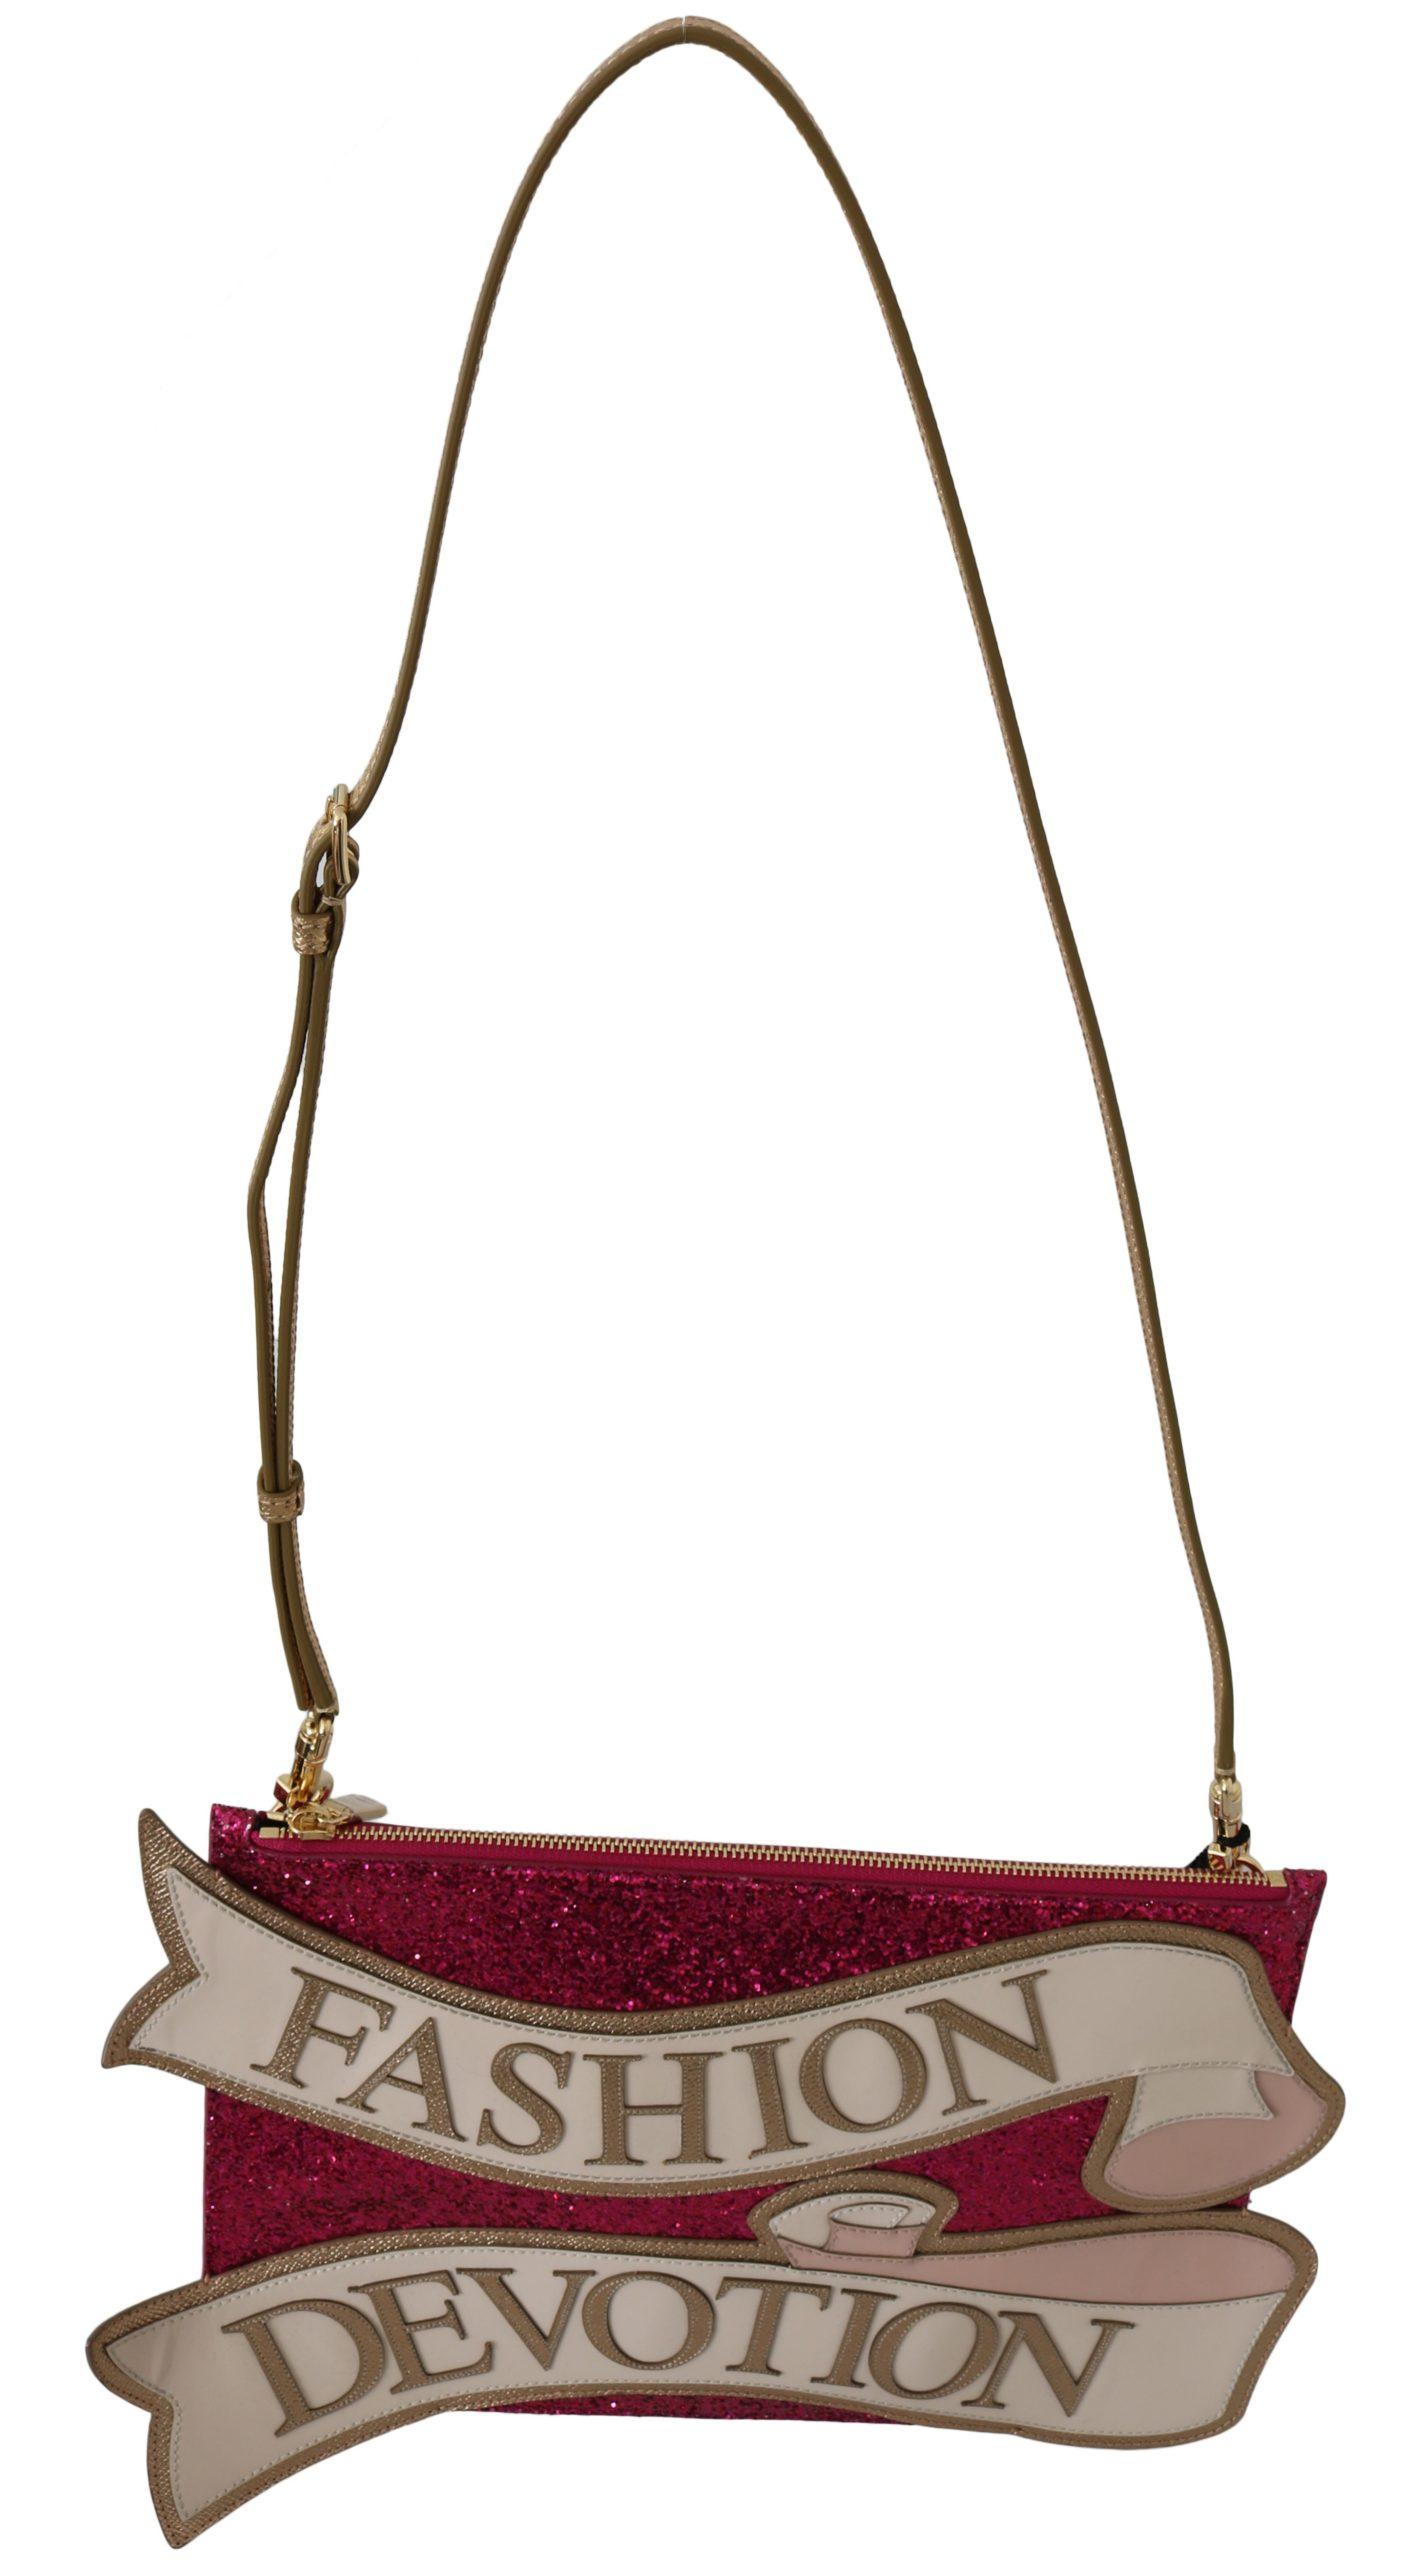 Dolce & Gabbana Women's Pink Glittered Fashion Shoulder Bag Pink VAS8735